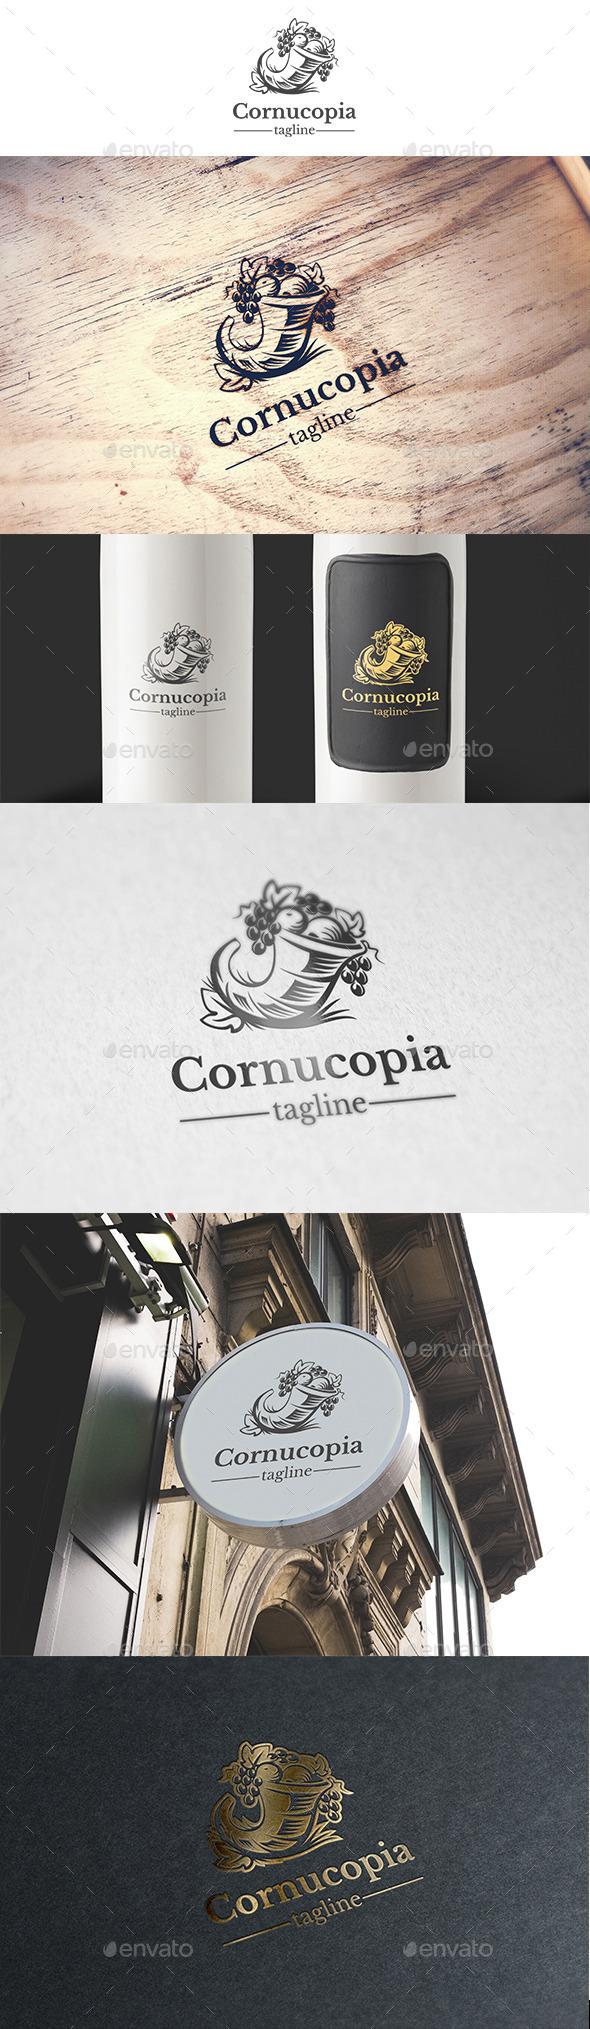 Cornucopia Logo Template - Food Logo Templates